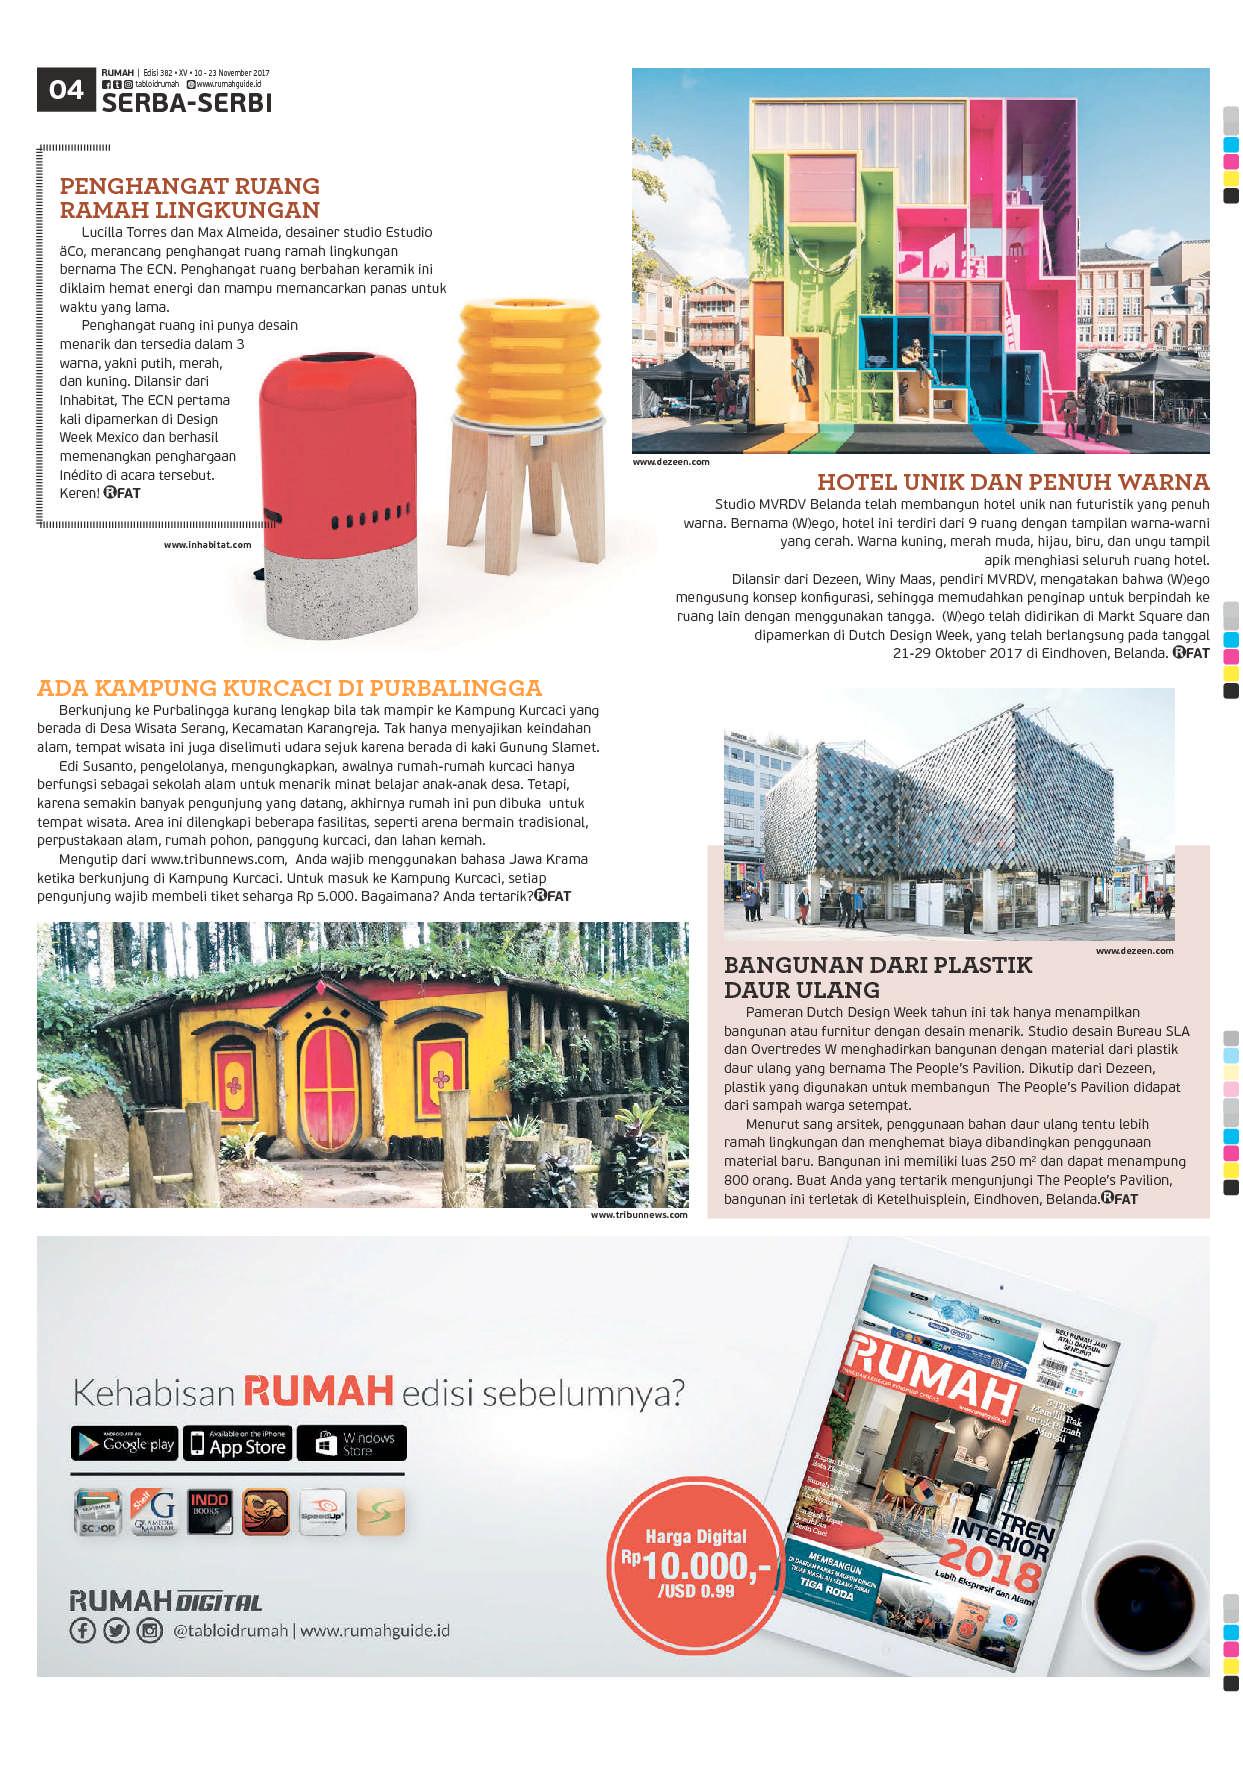 Jual majalah tabloid rumah ed 382 2017 gramedia digital indonesia